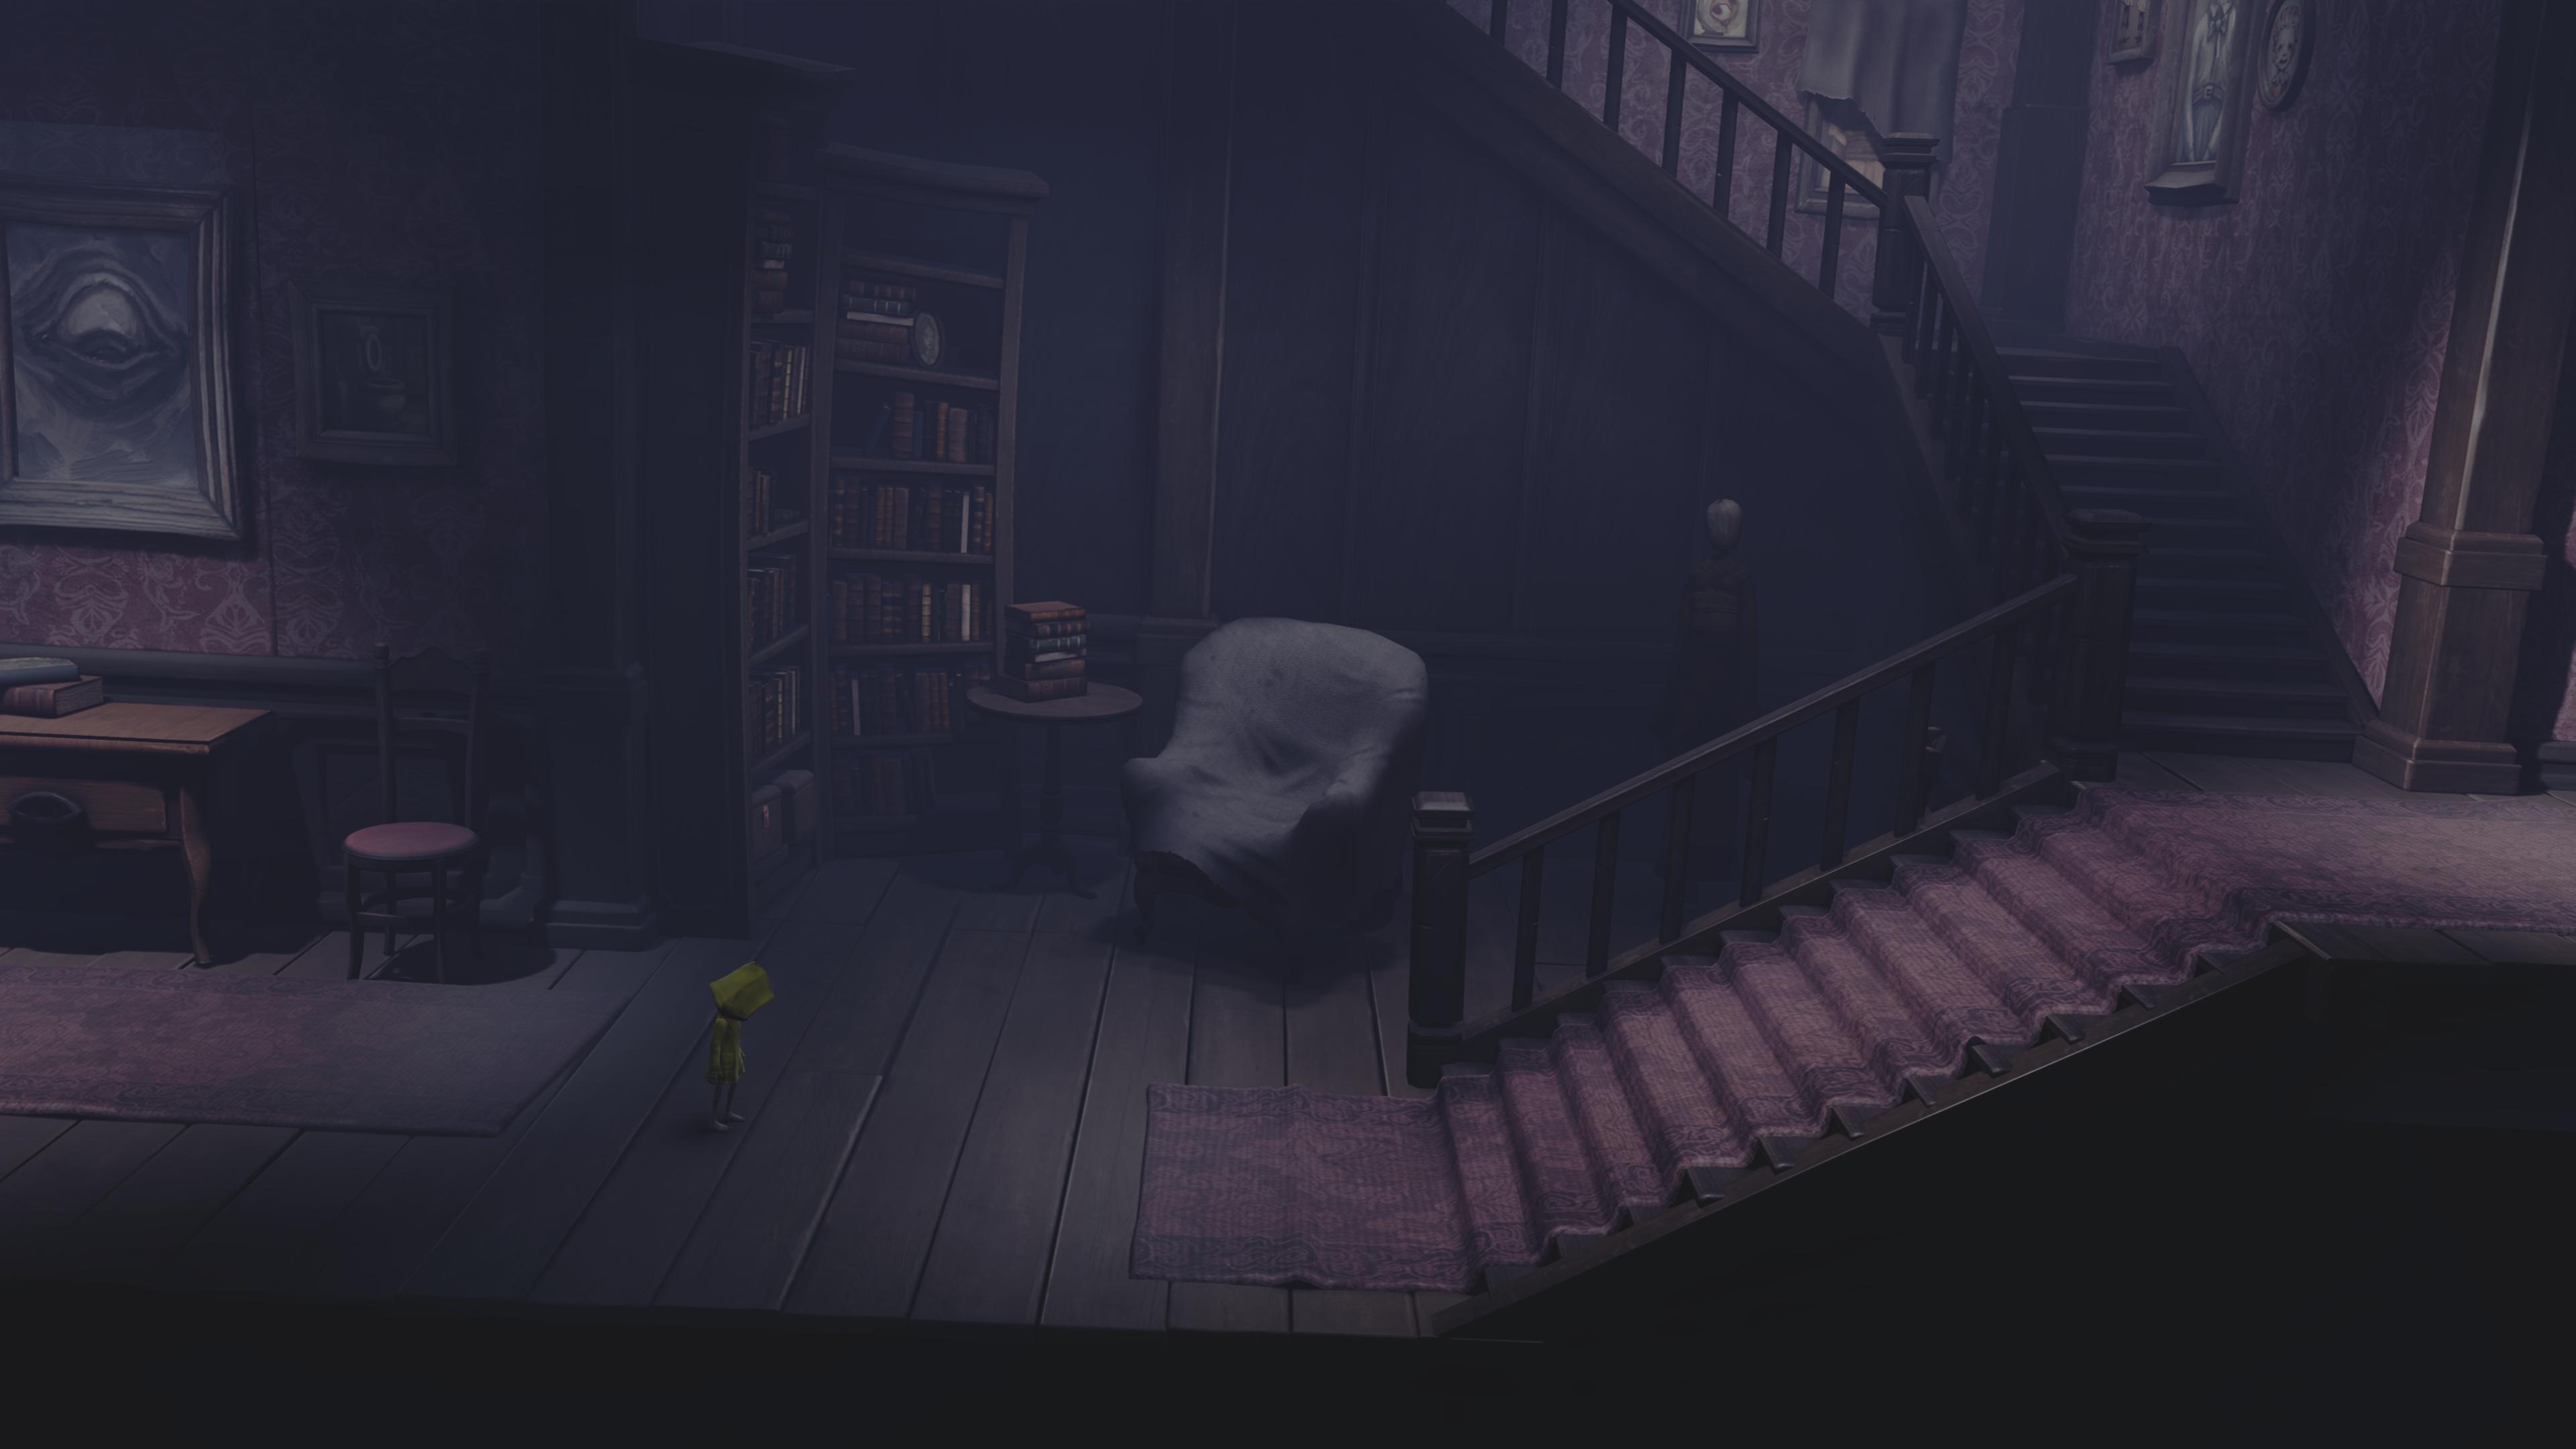 Little Nightmares 4k Ultra Hd Wallpaper Background Image